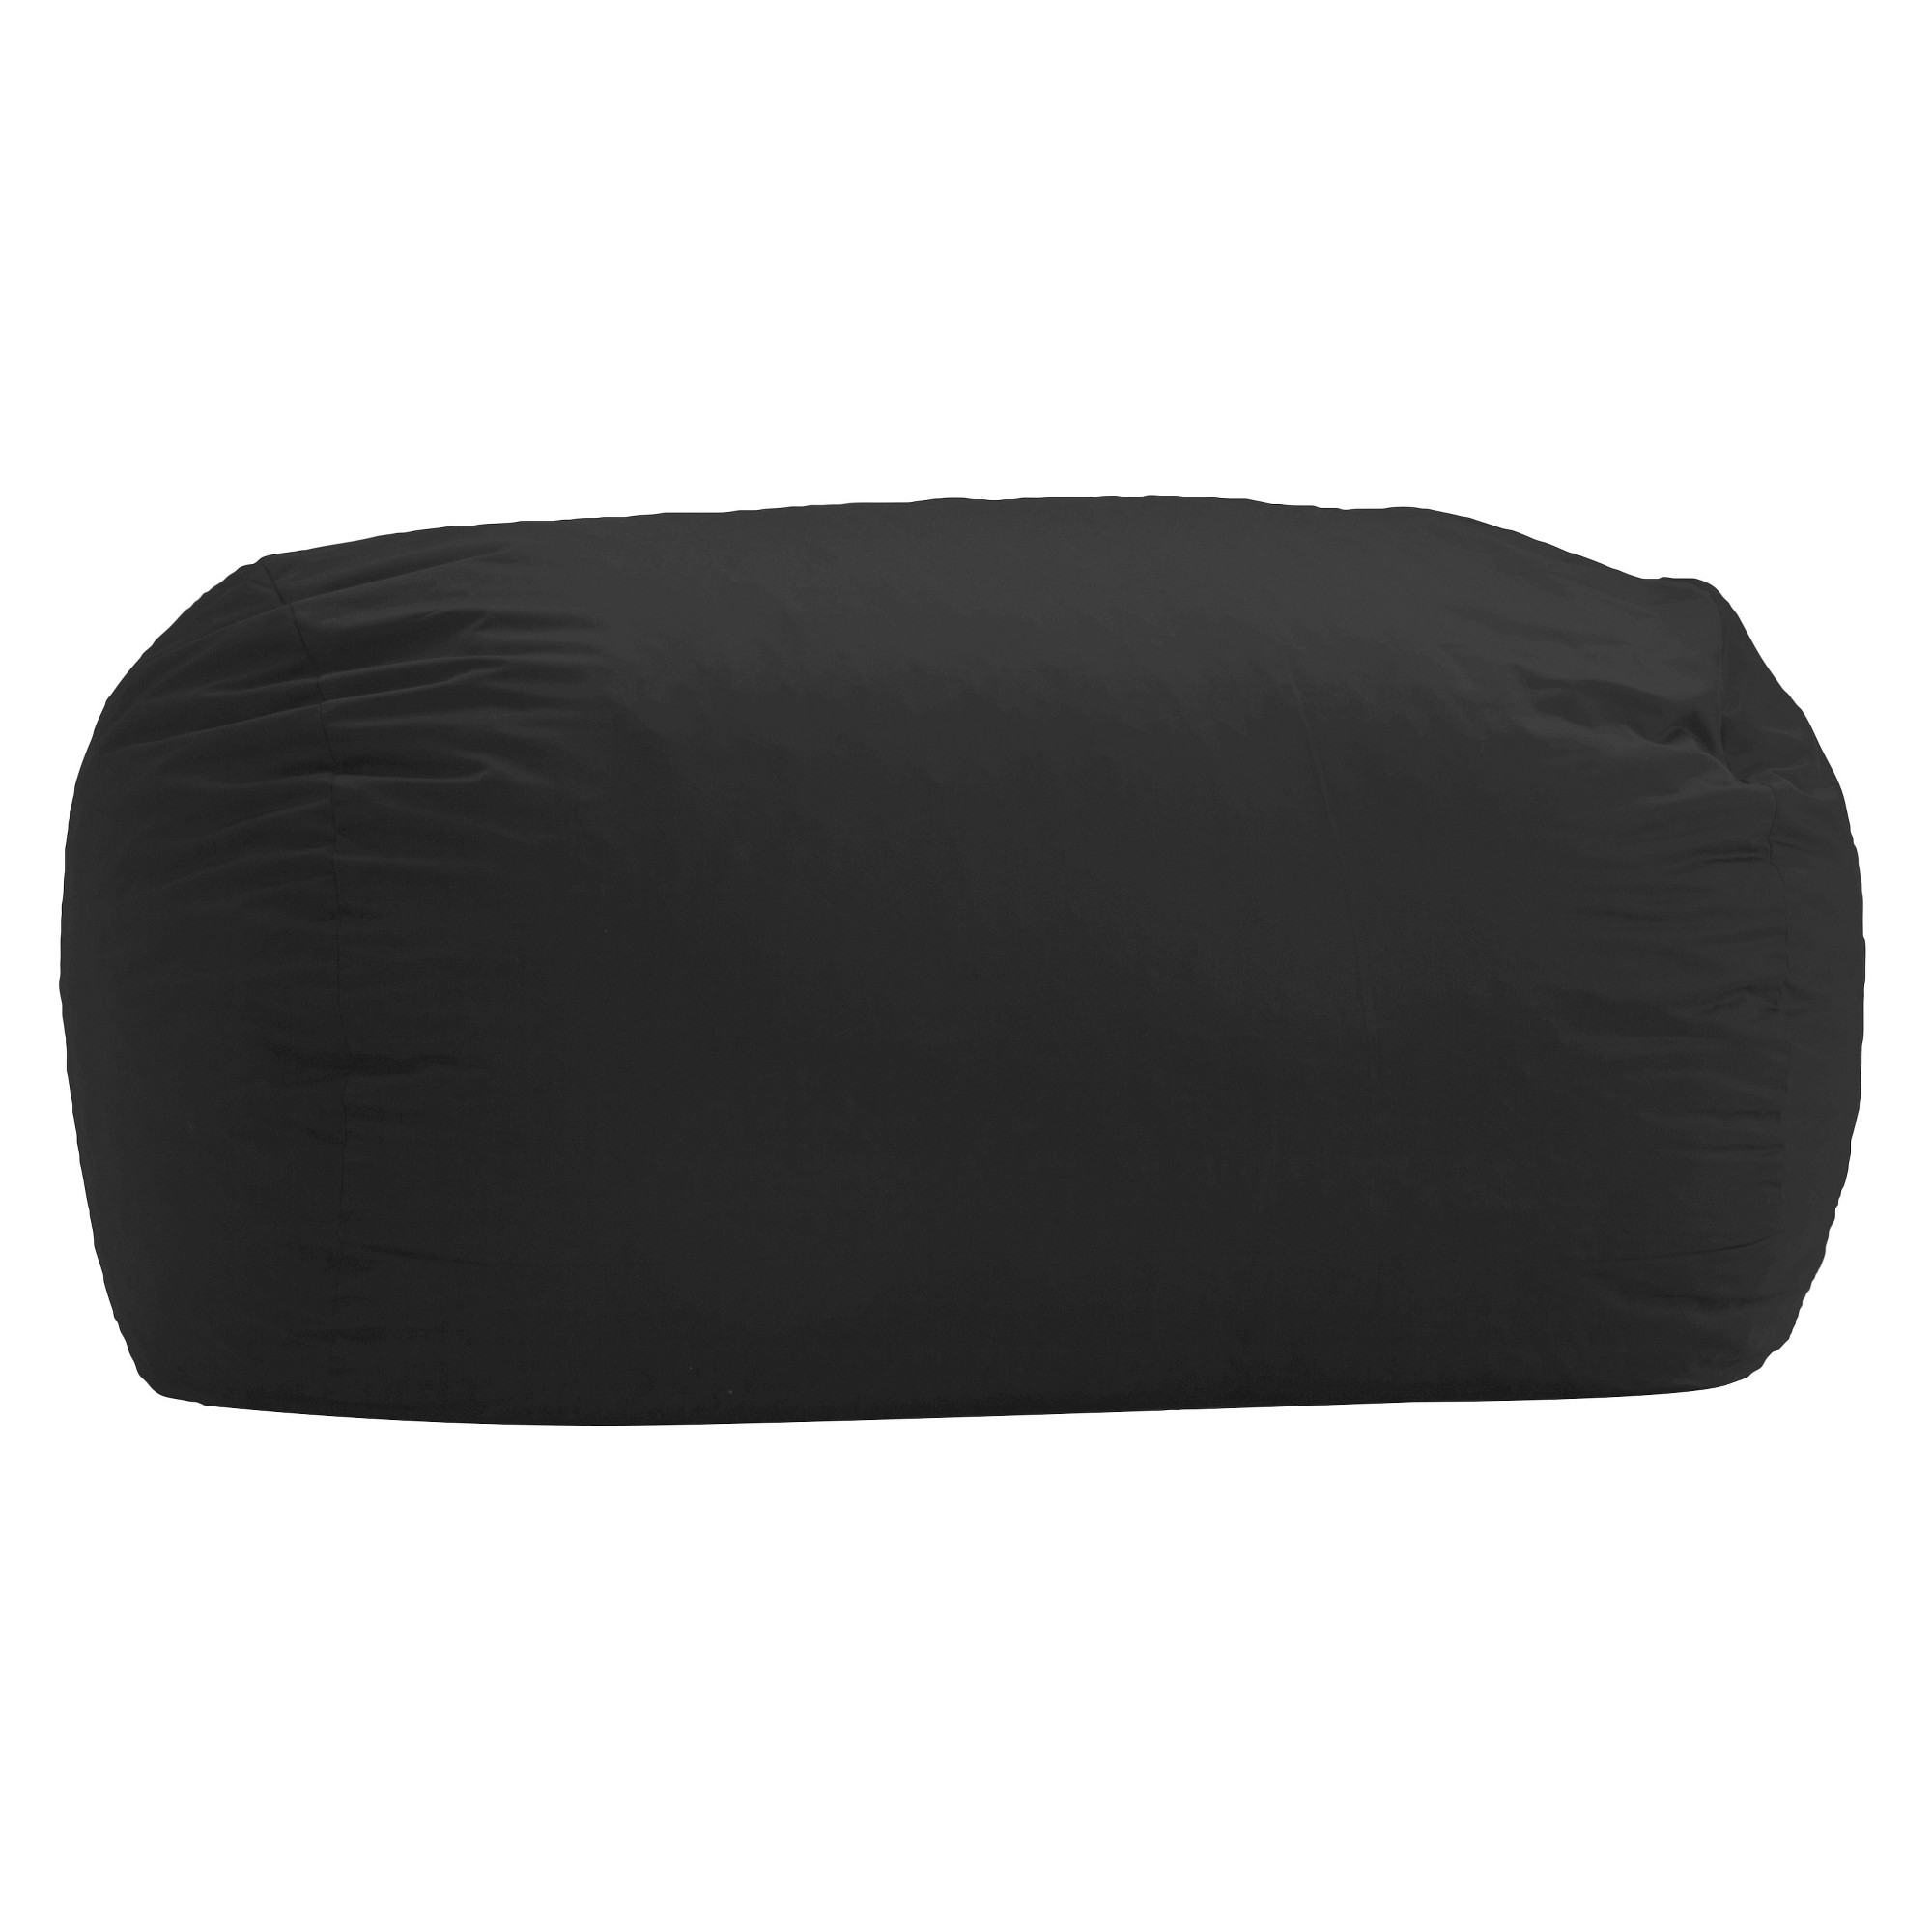 Media Lounger Bean Bag Chair 6 Black Joe